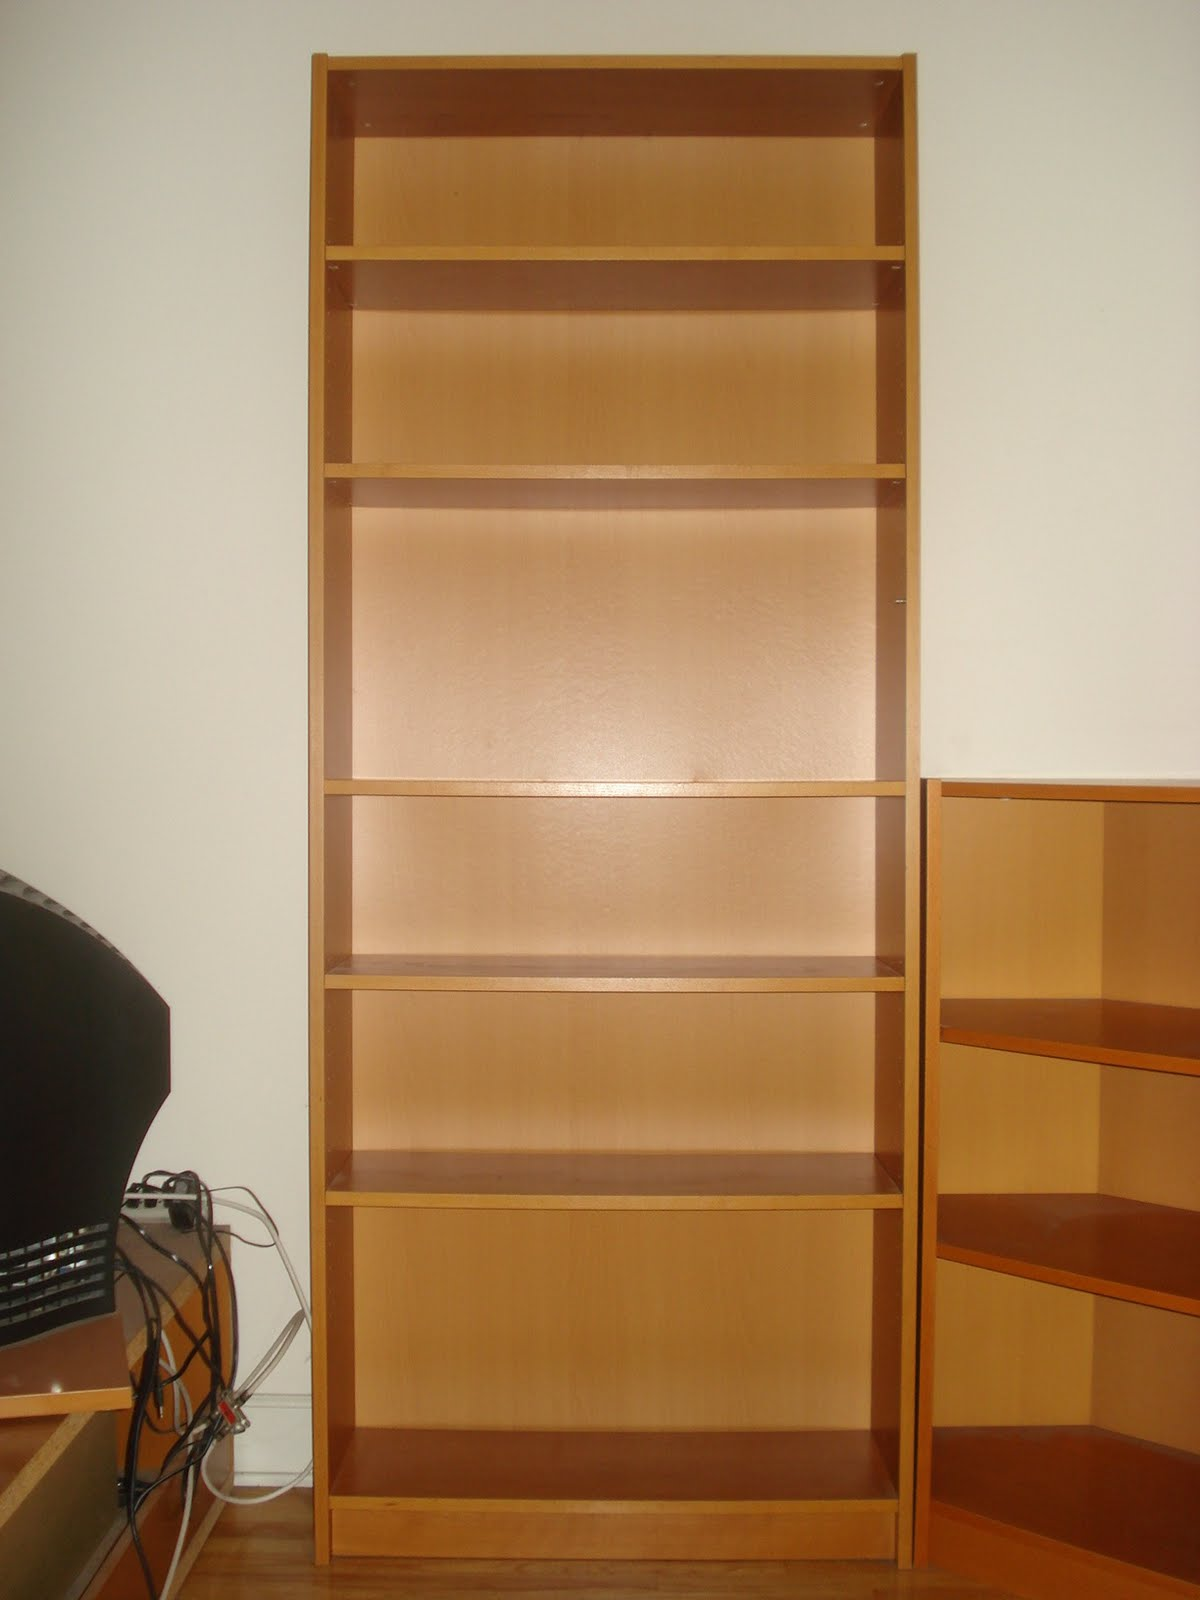 Craig S Garage Sale Ikea Tall Bookcase